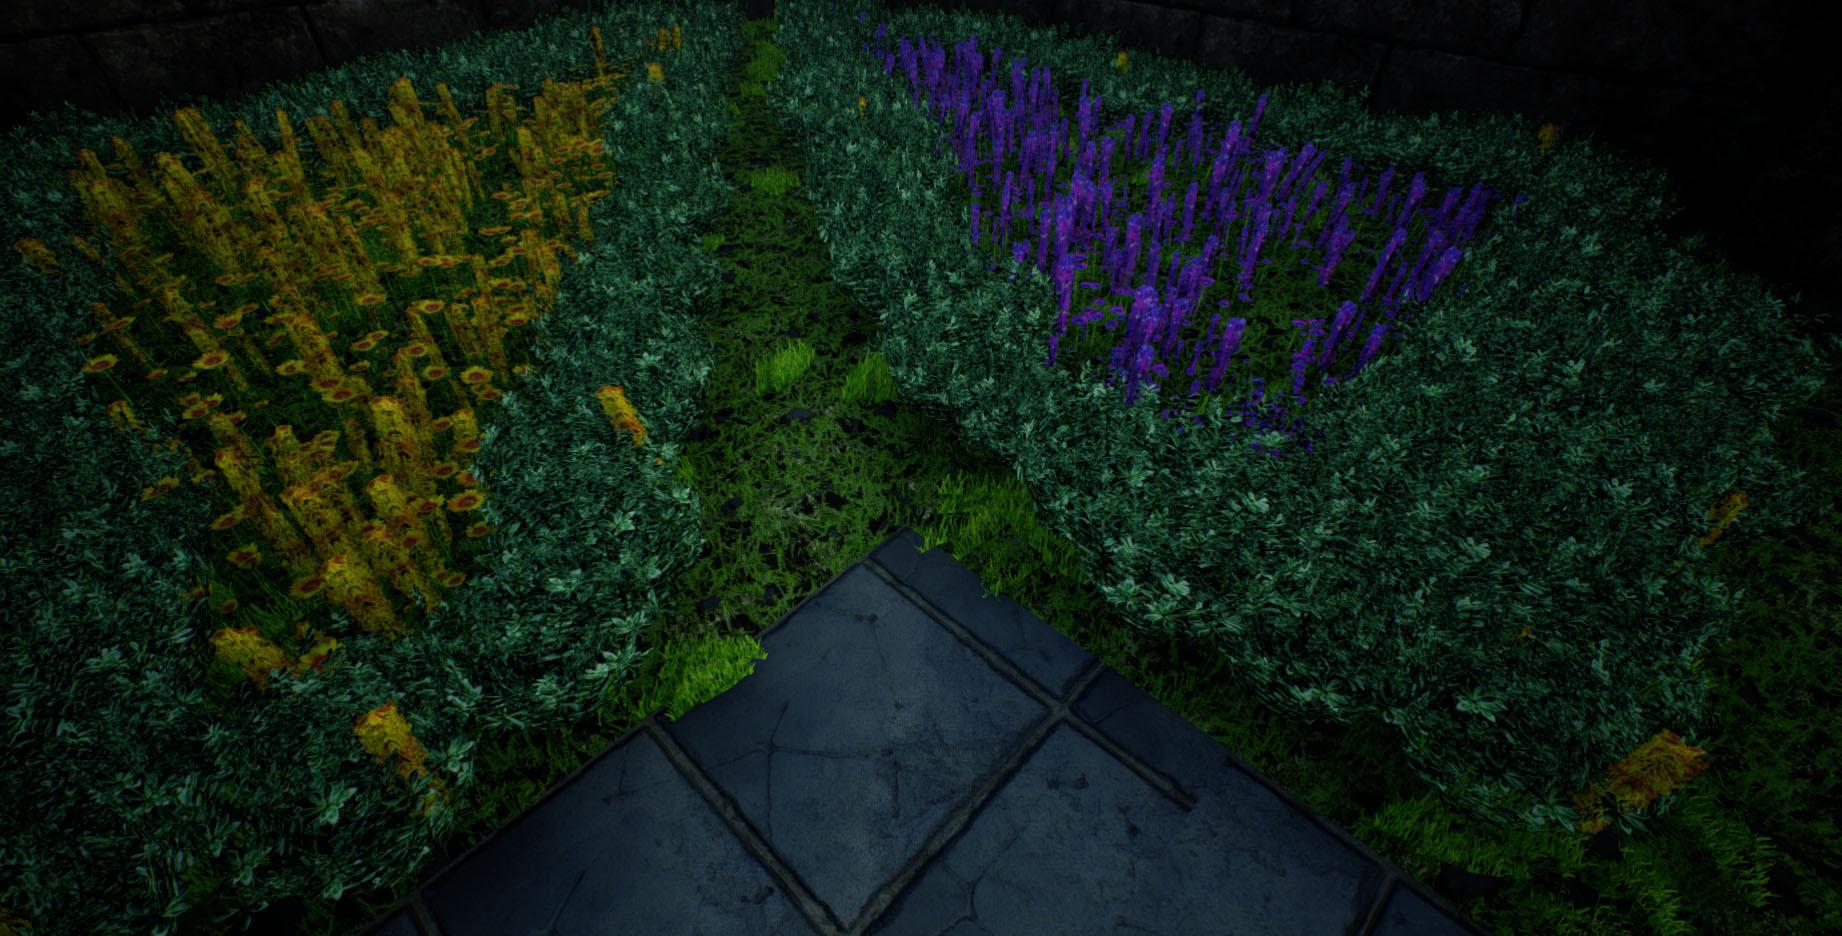 courtyard_wip8_foliage.jpg